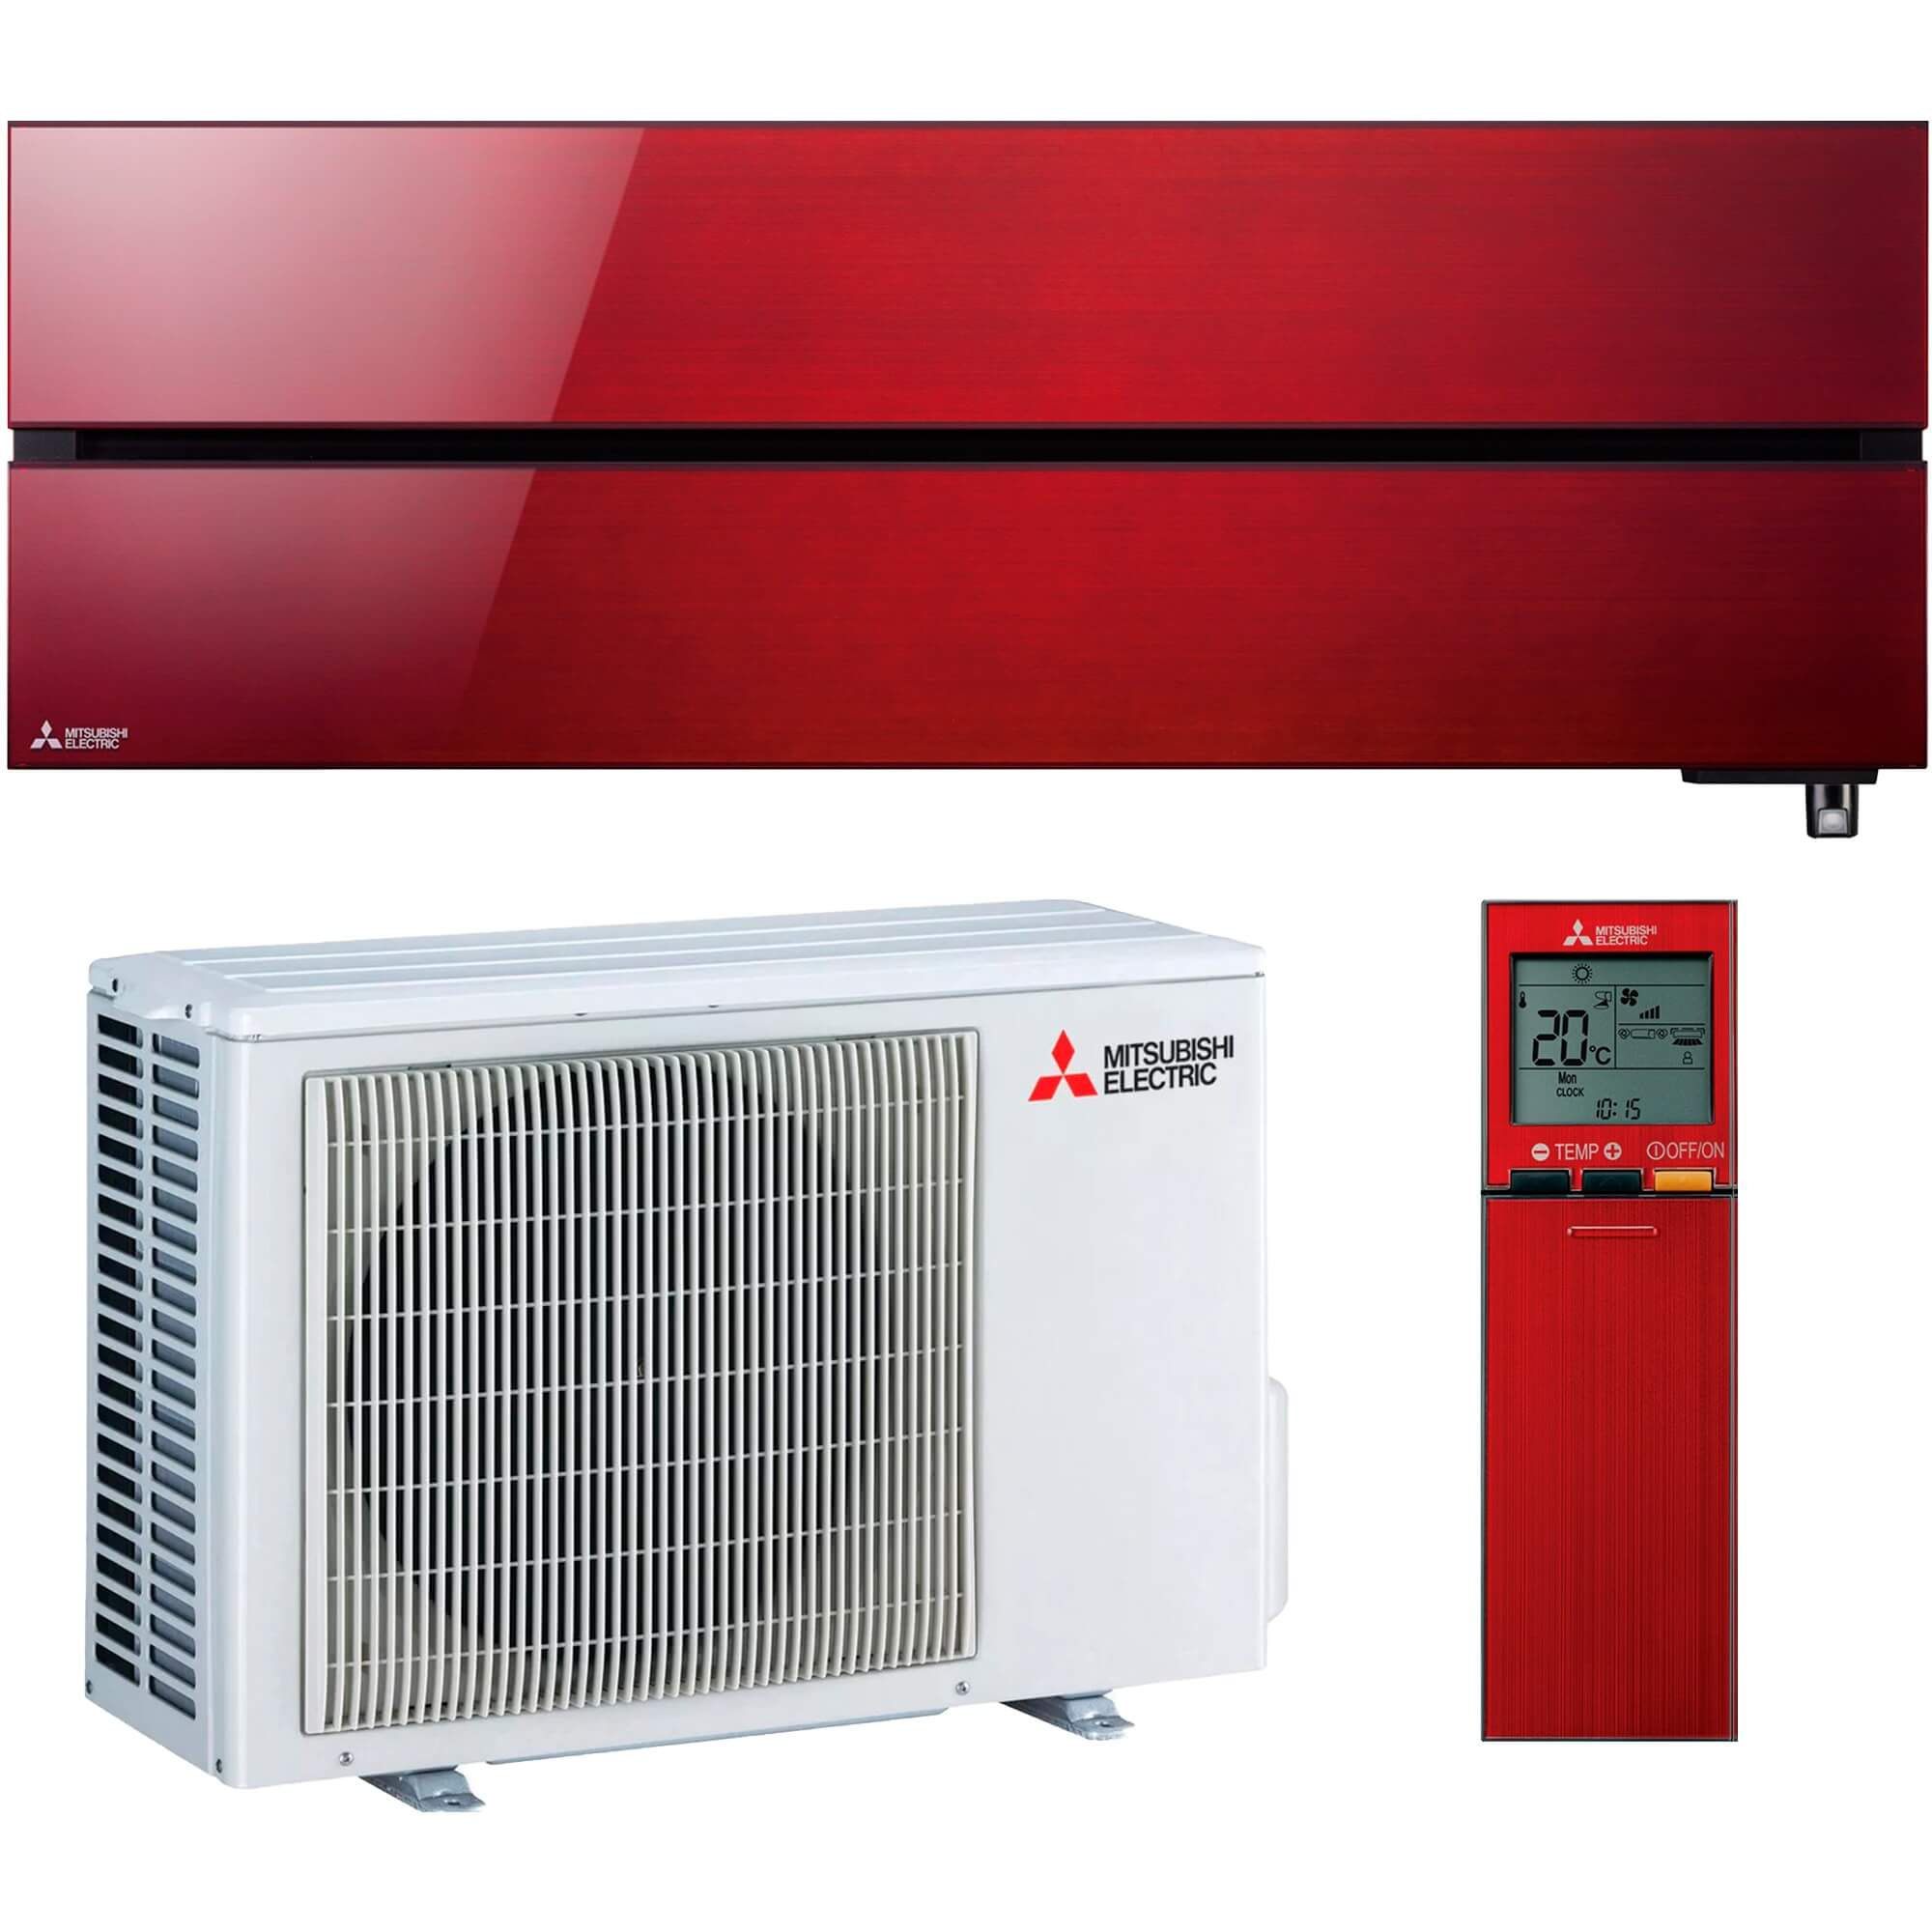 Тепловой насос Mitsubishi Electric MSZ-LN50VGR/MUZ-LN50VGHZ